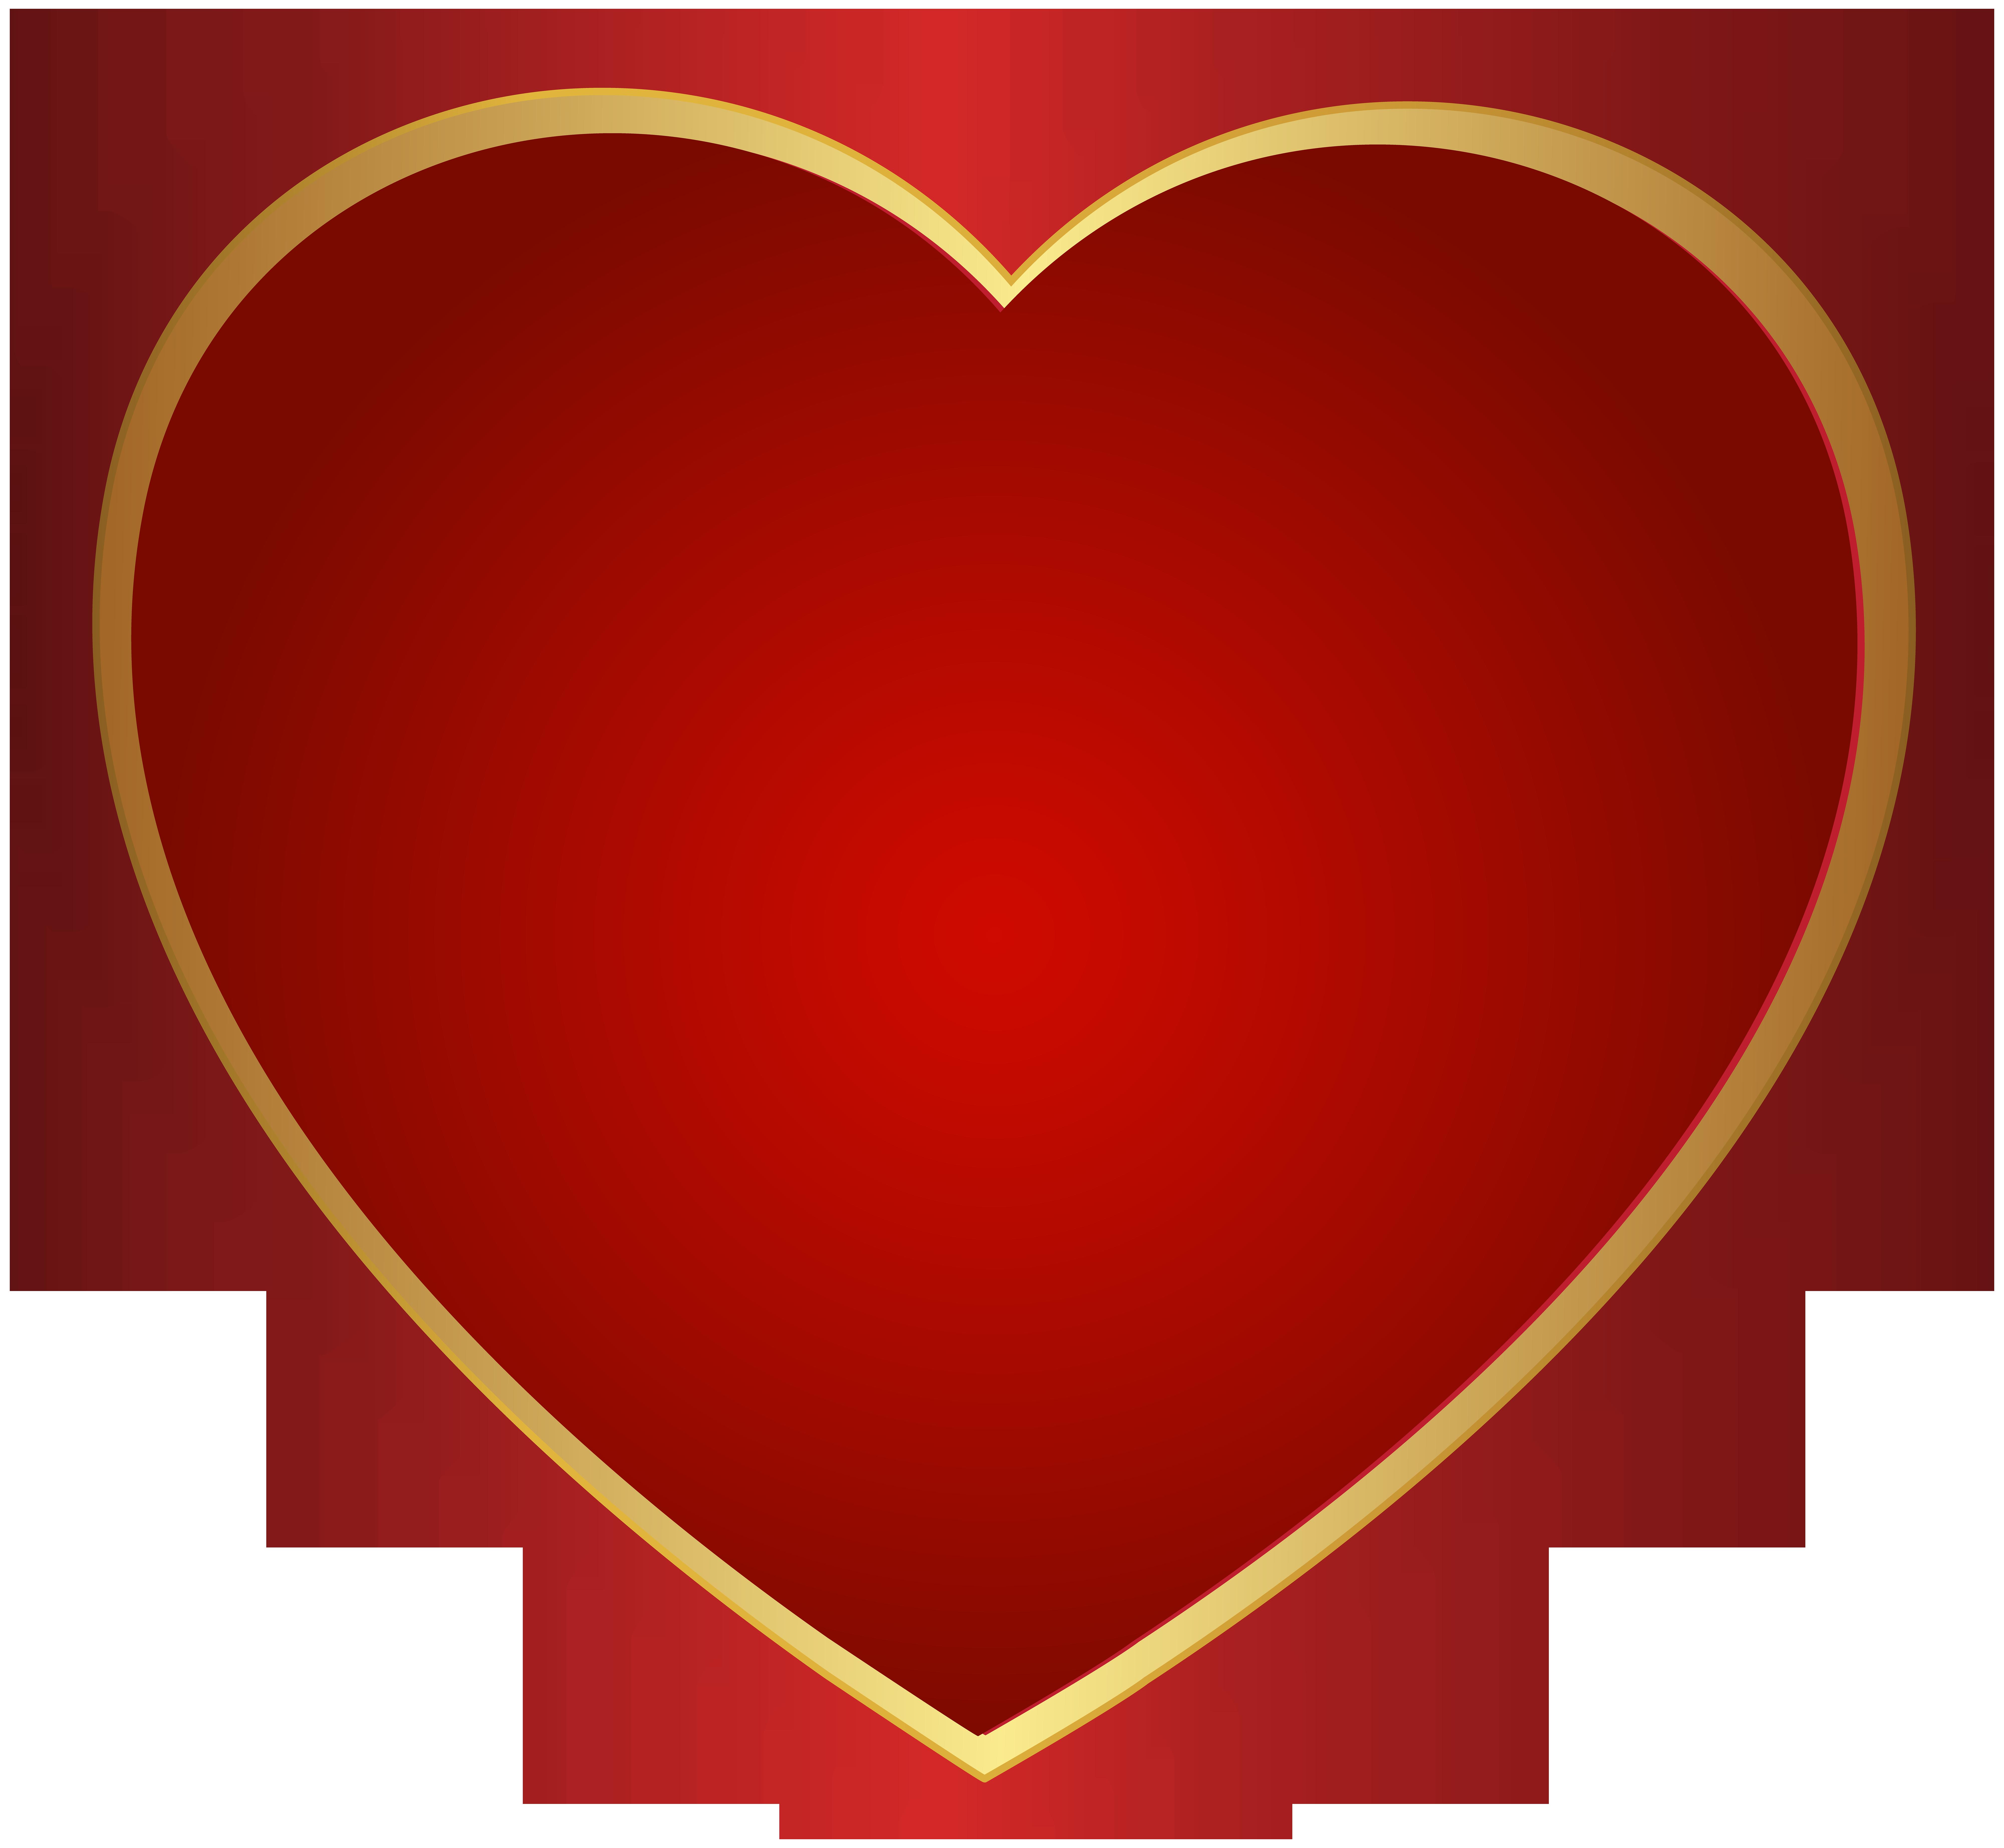 clipart heart orange